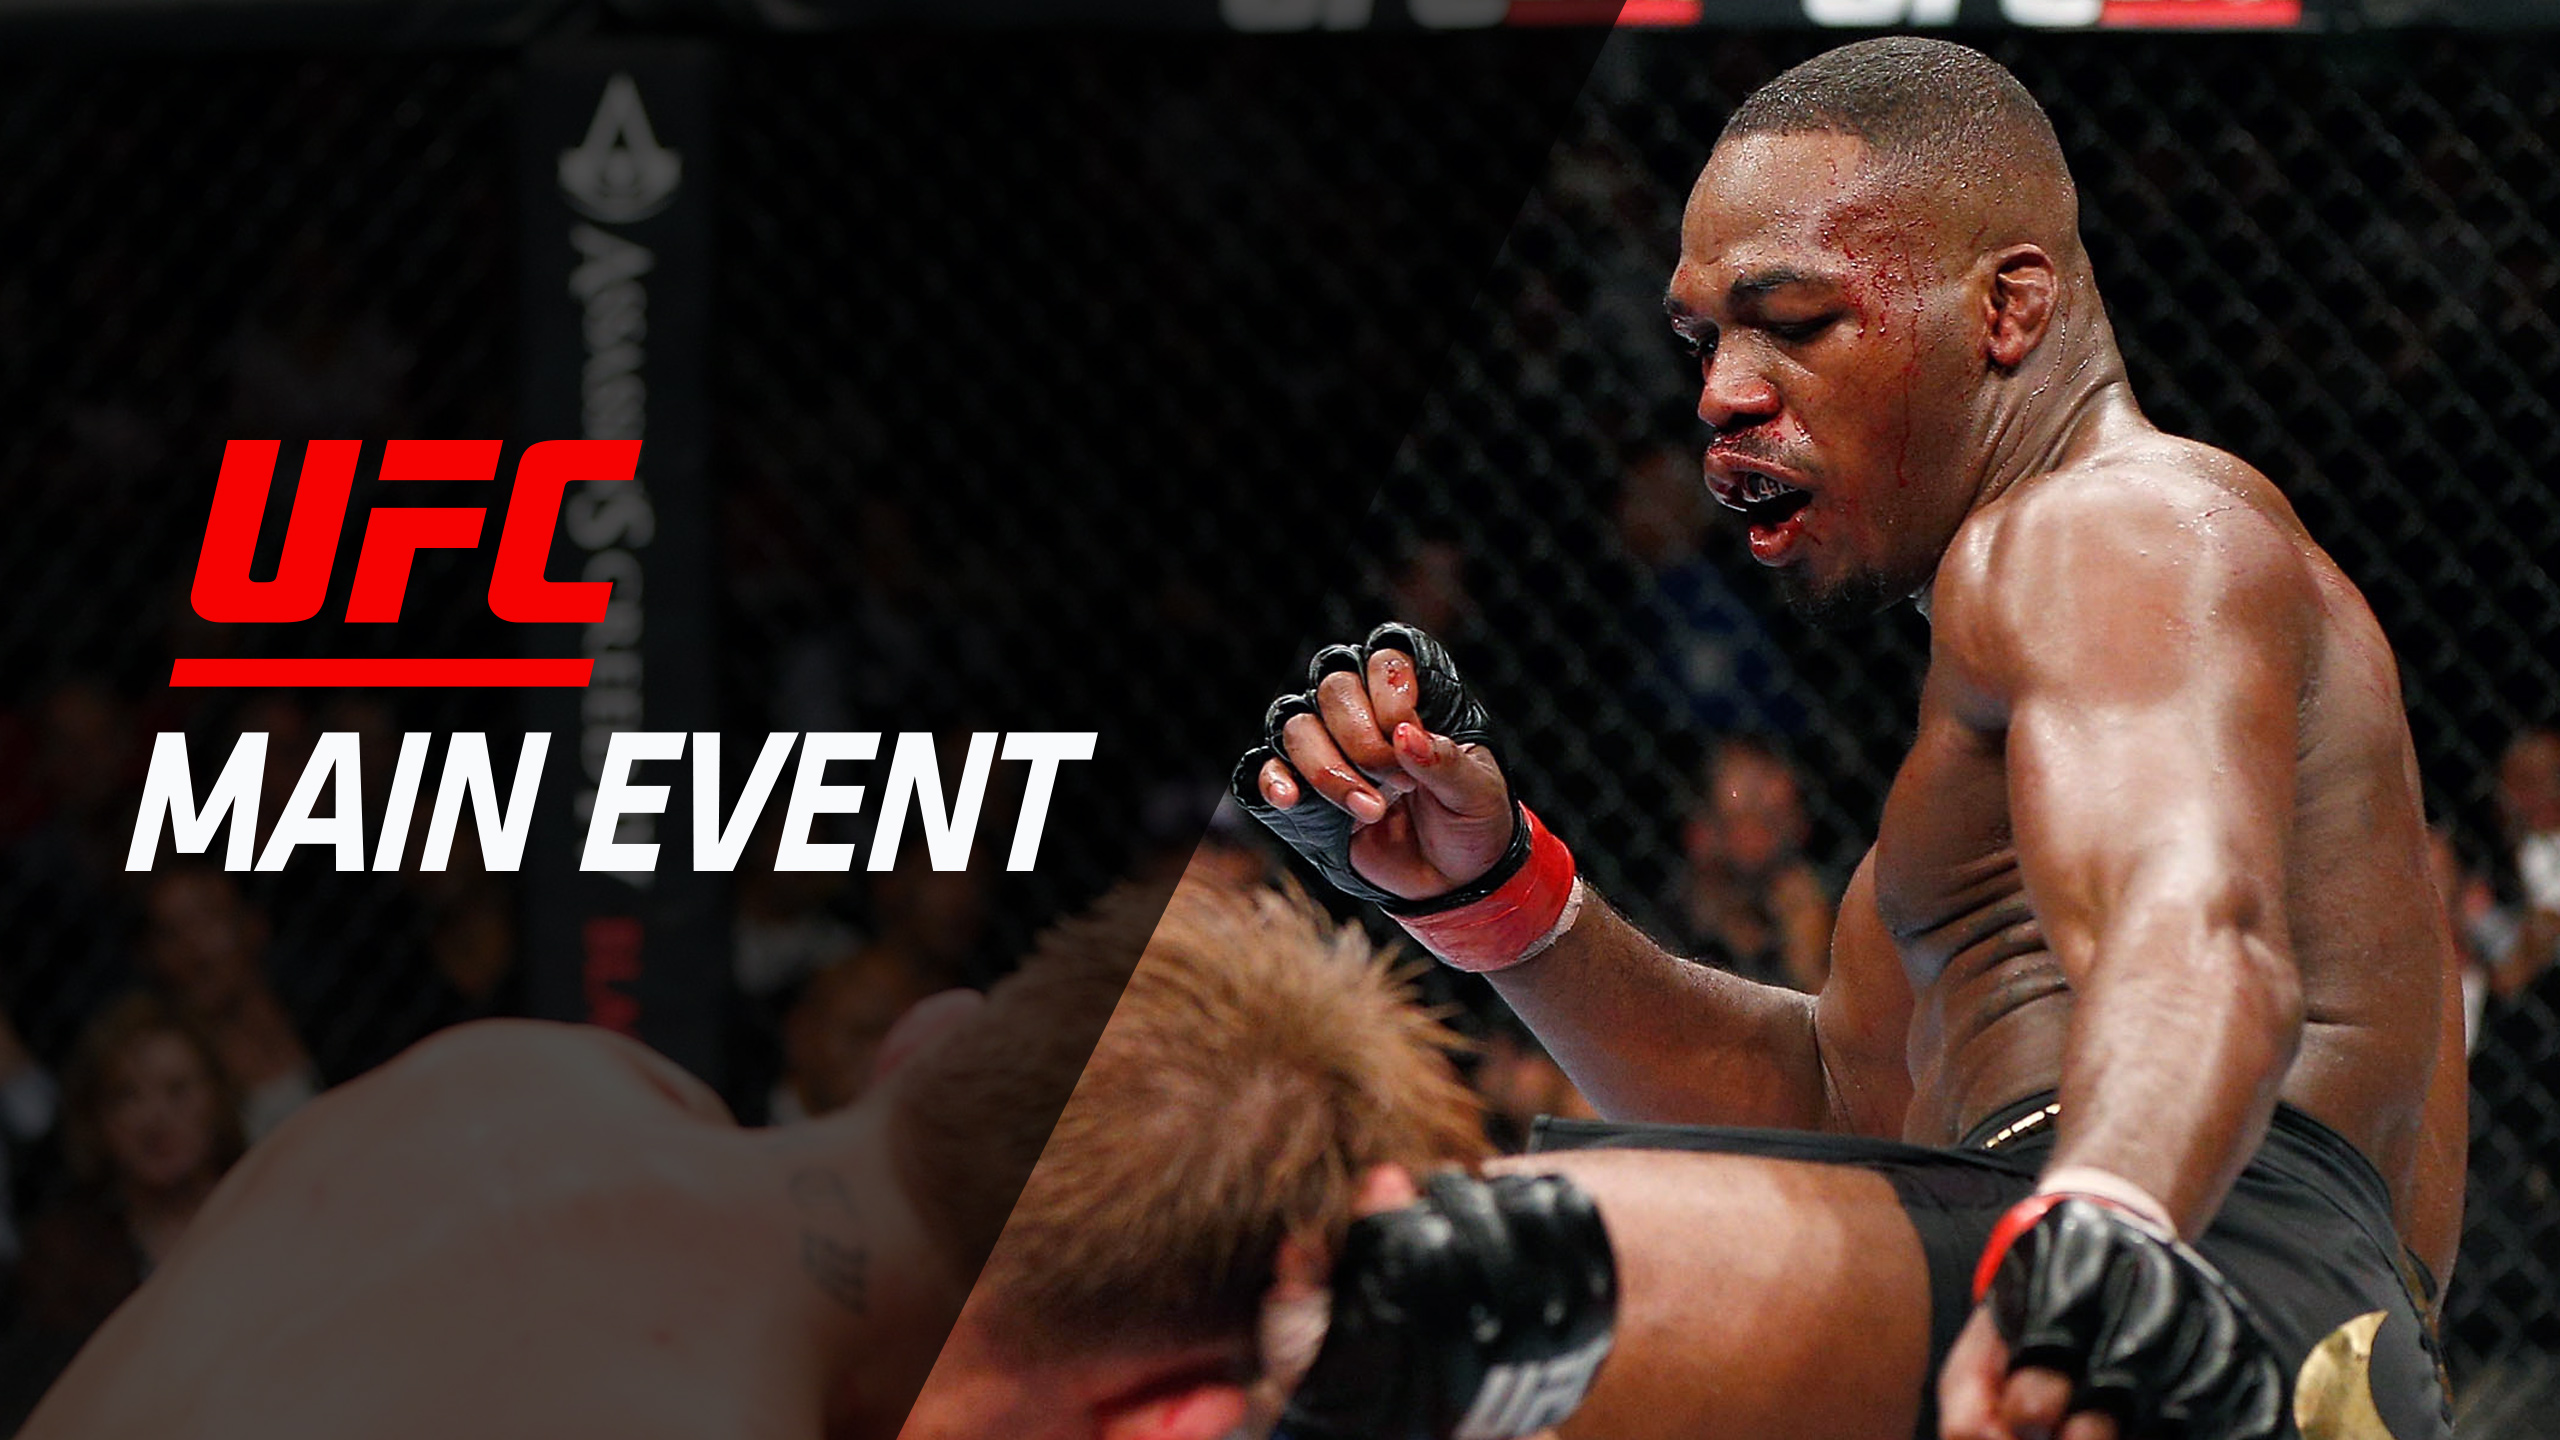 UFC Main Event: Jones vs. Gustafsson 1